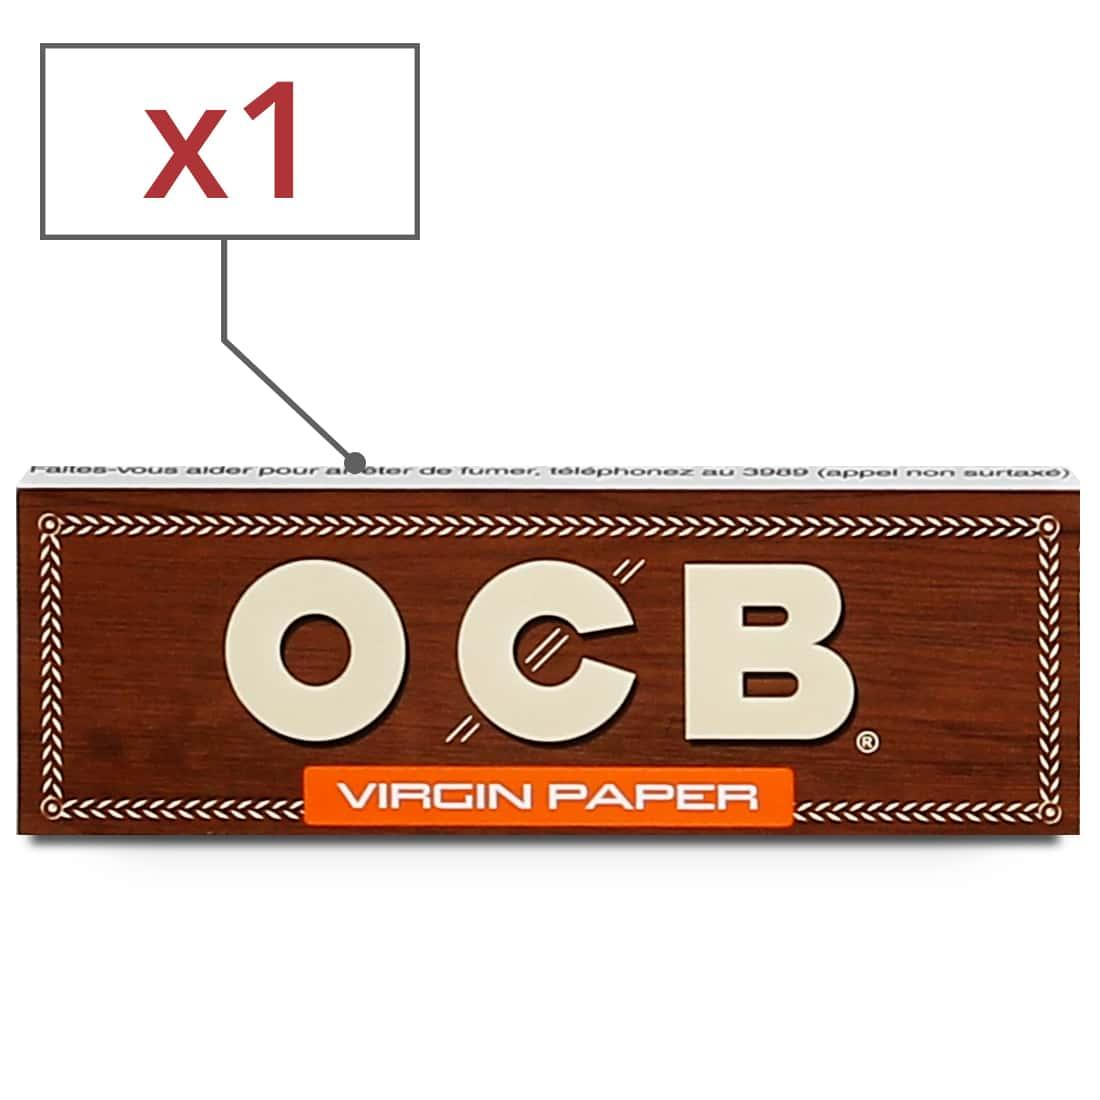 Photo de Papier a rouler OCB Virgin 1 1/4 x 1